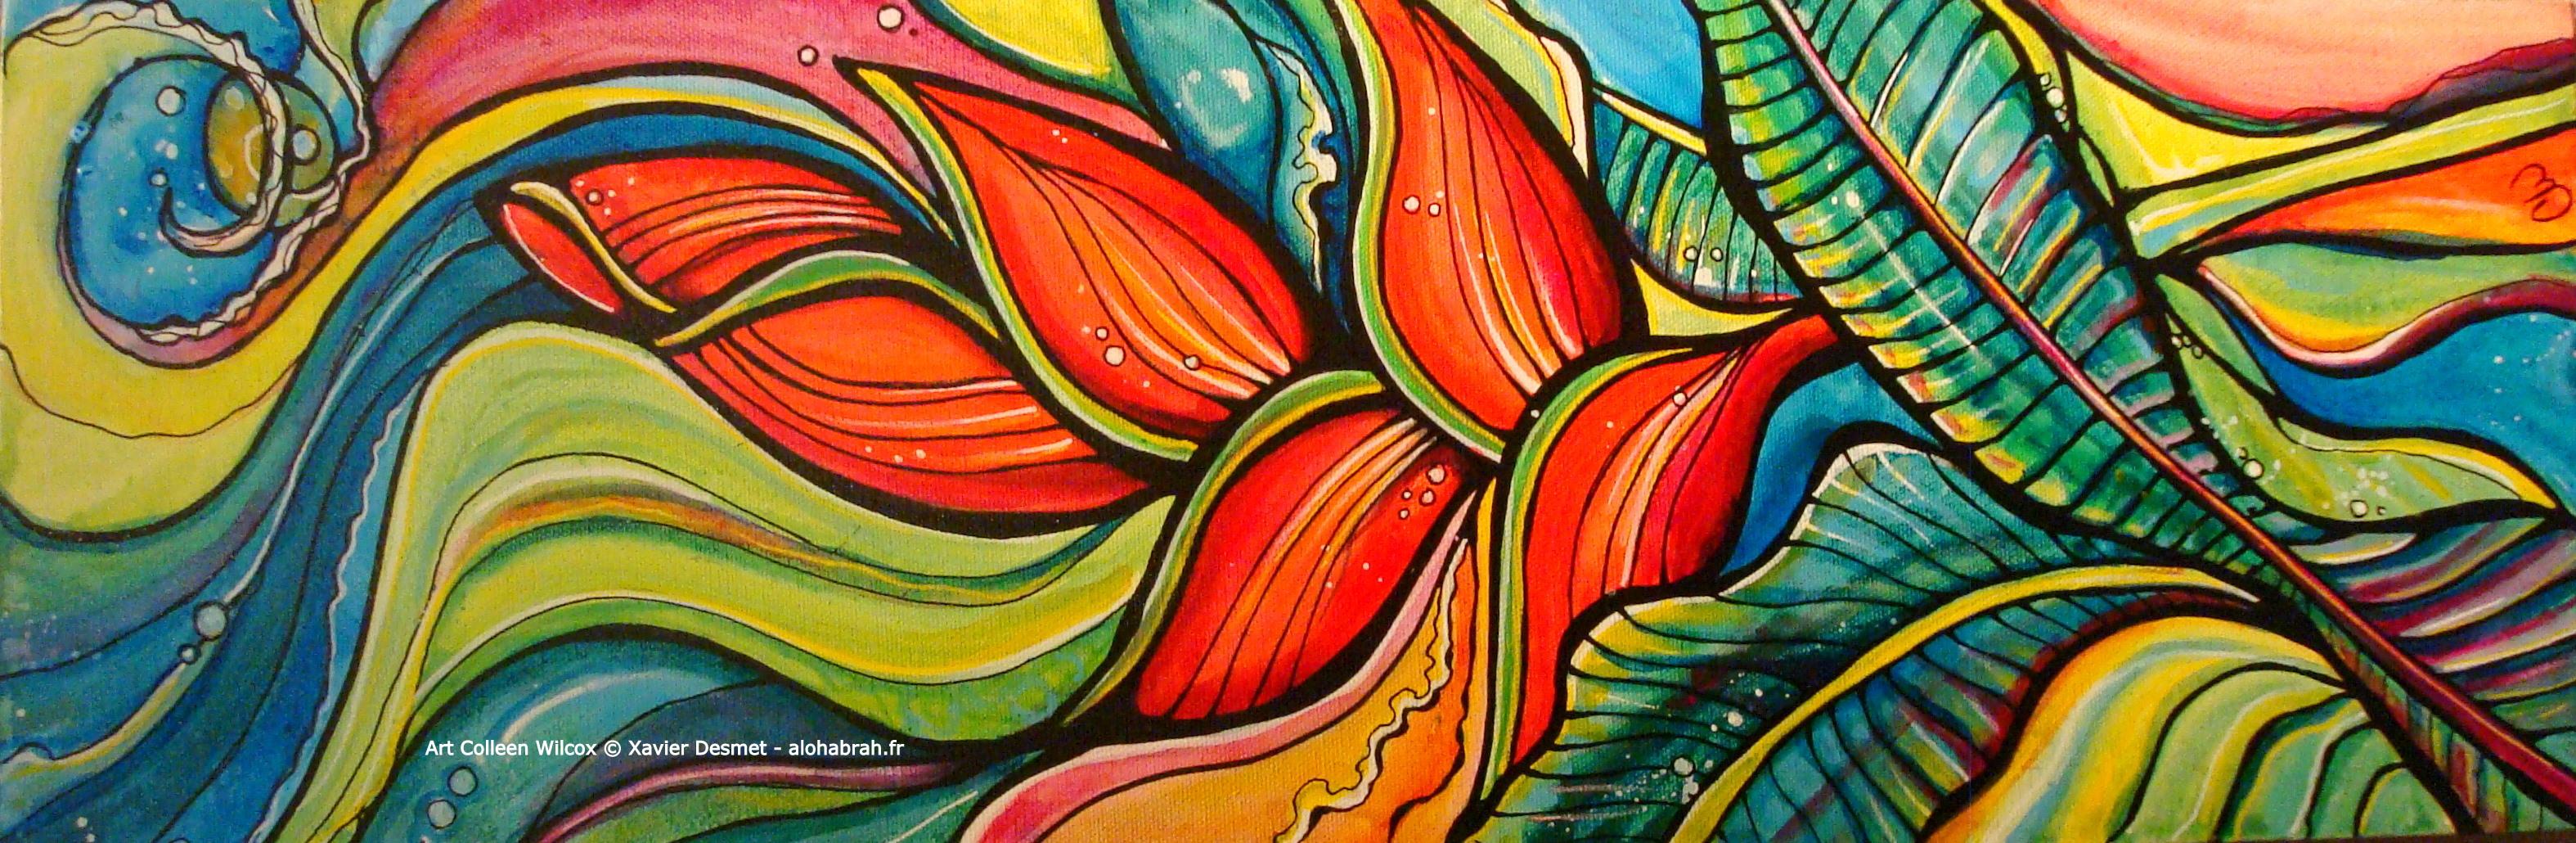 Wave Plants - Art Colleen Wilcox © Xavier Desmet - alohabrah.fr